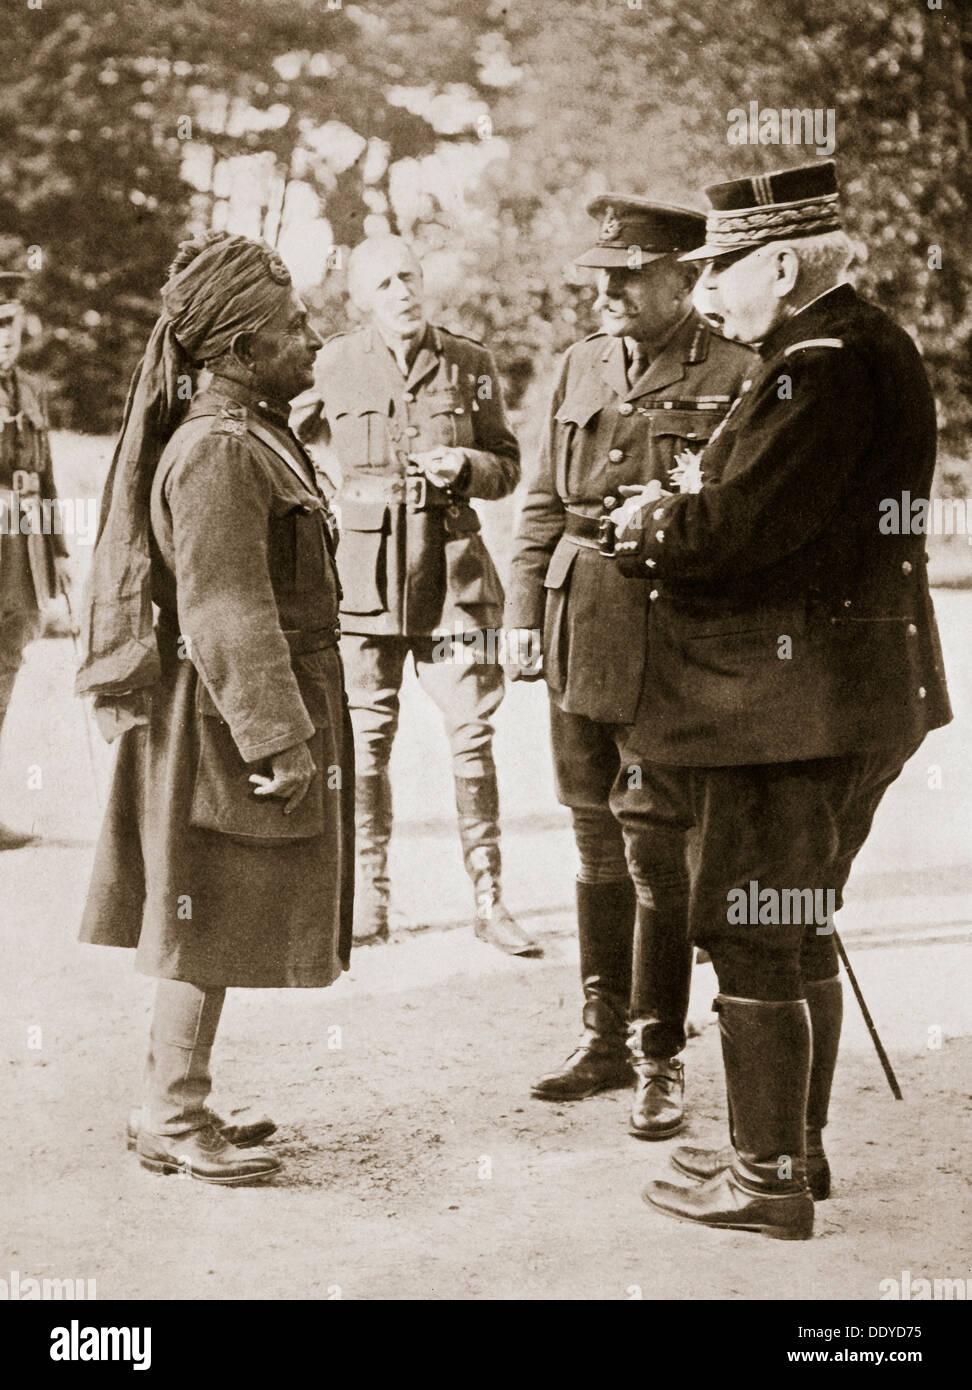 General Sir Douglas Haig introducing General Joffre to Lieutenant-General Sir Pertab Singh, 1916. Artist: Unknown - Stock Image